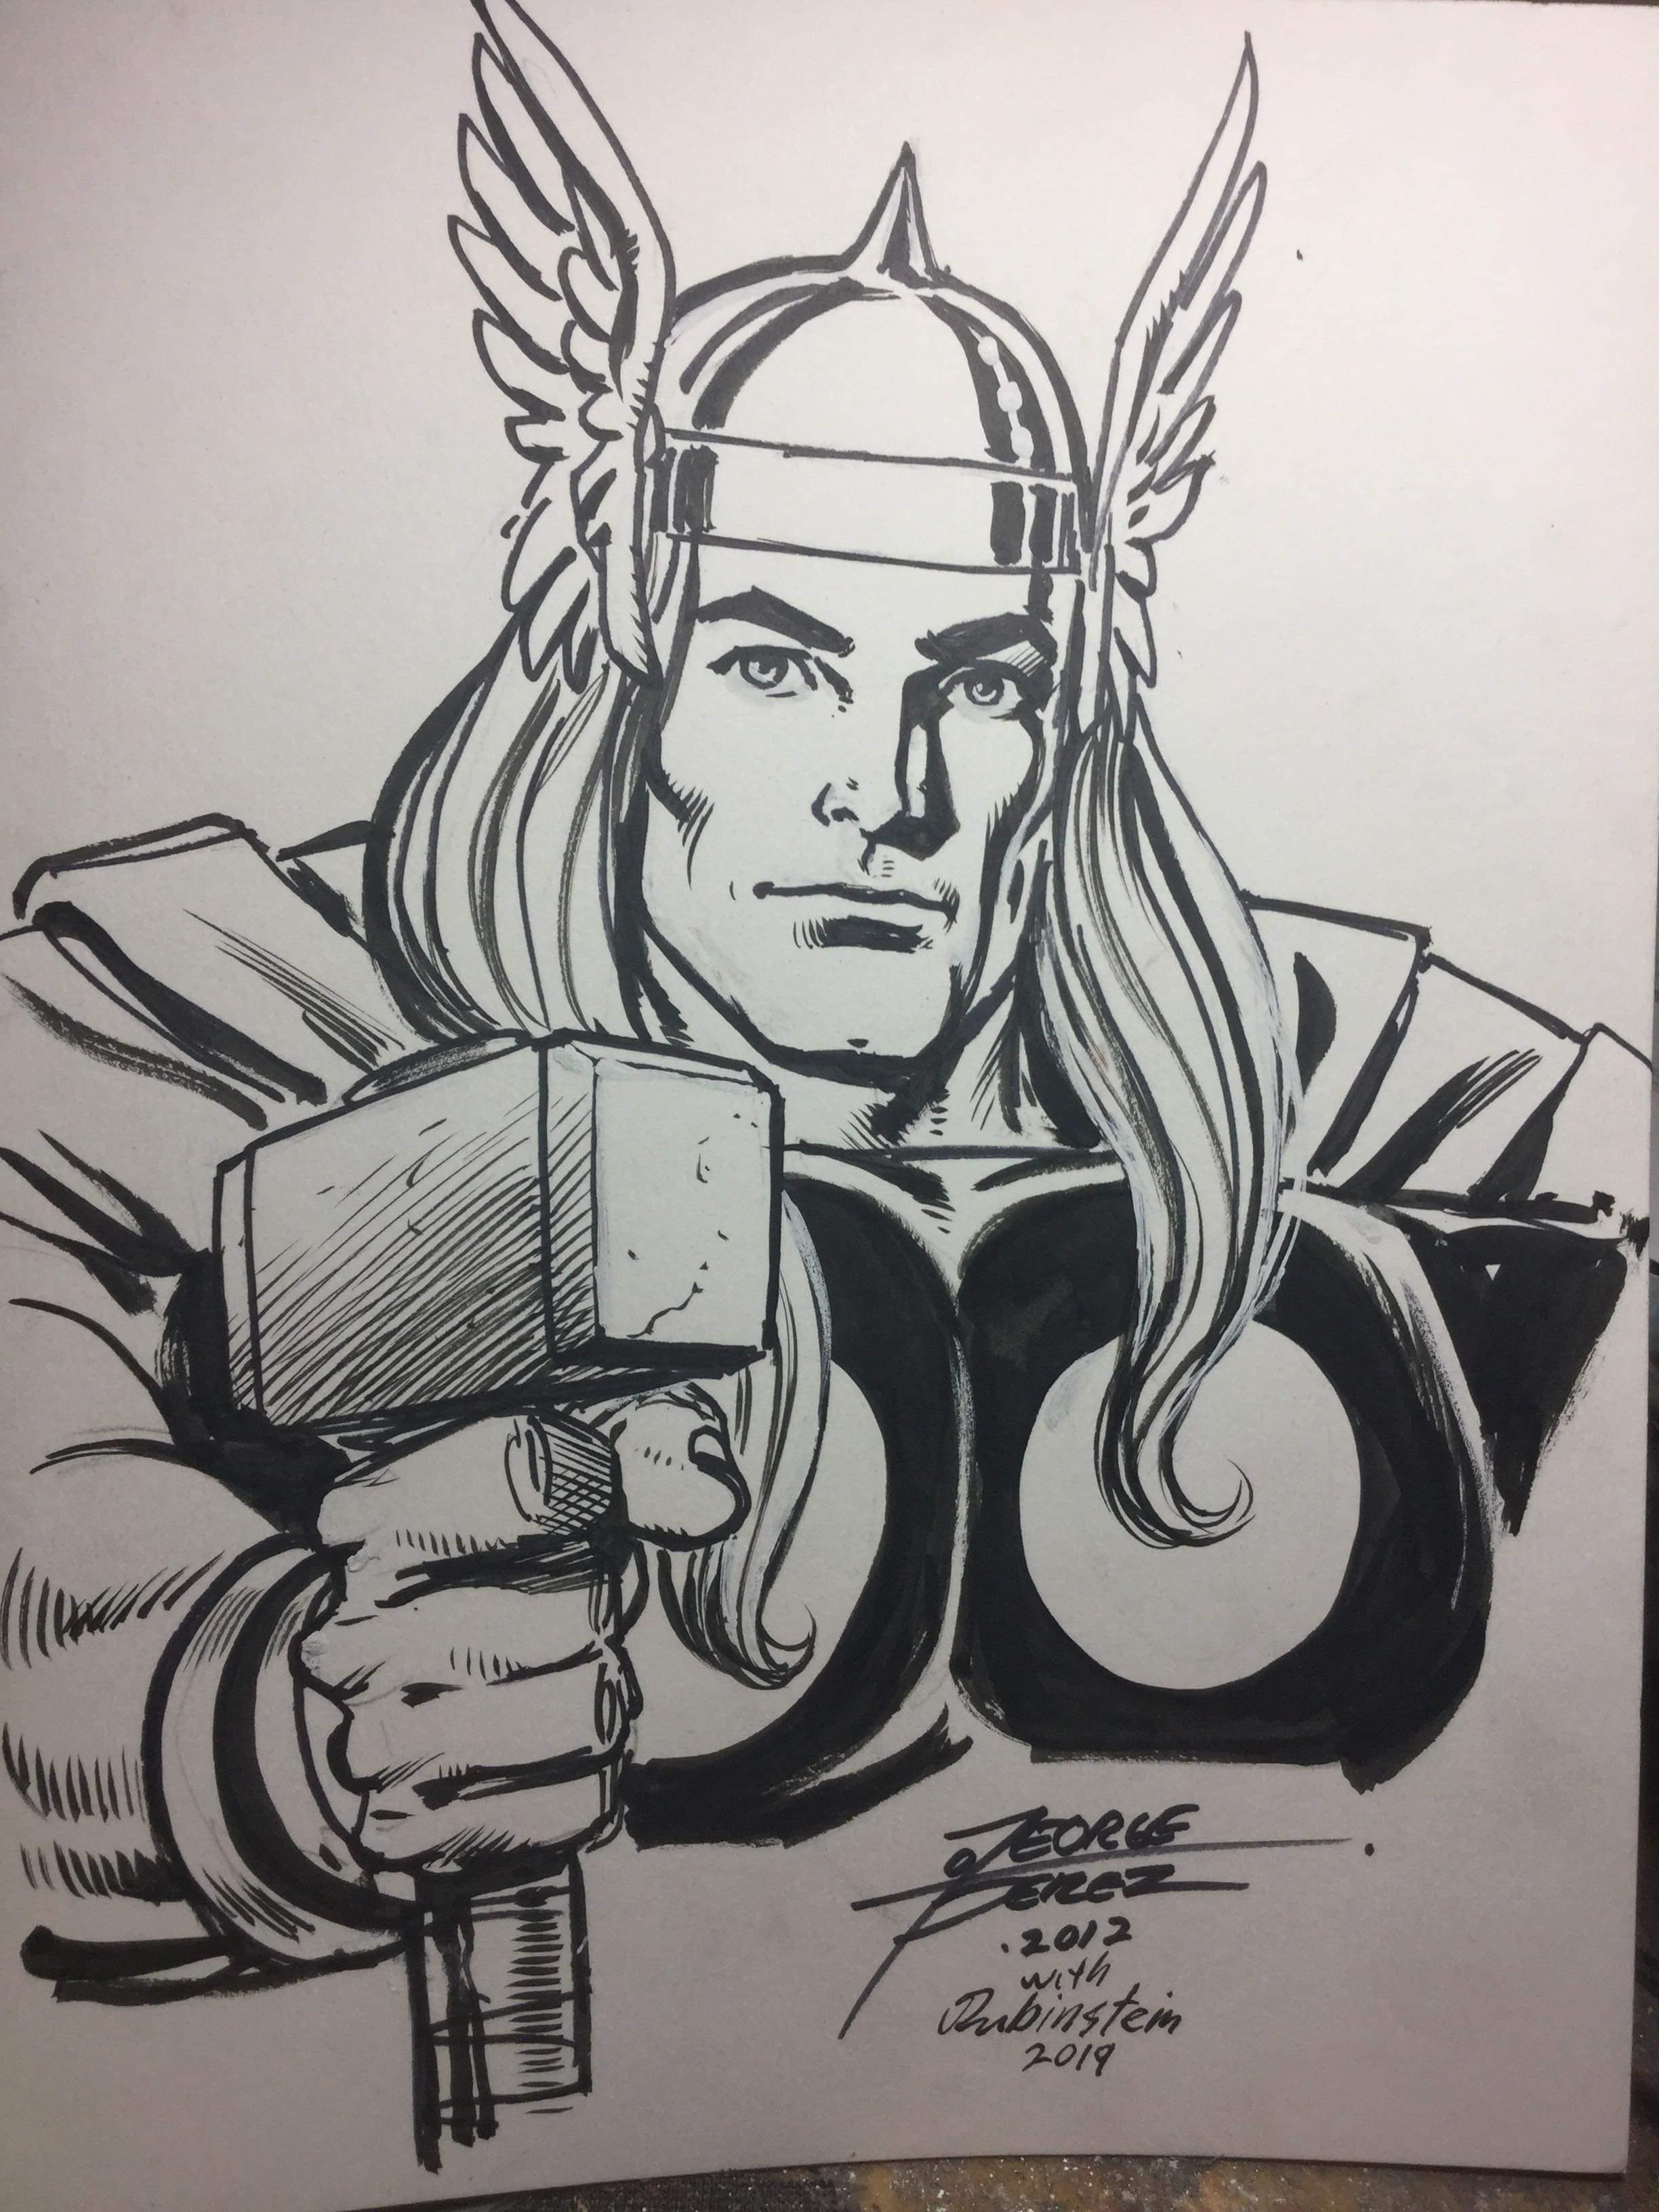 Thor: After, Inked by Joe Rubinstein